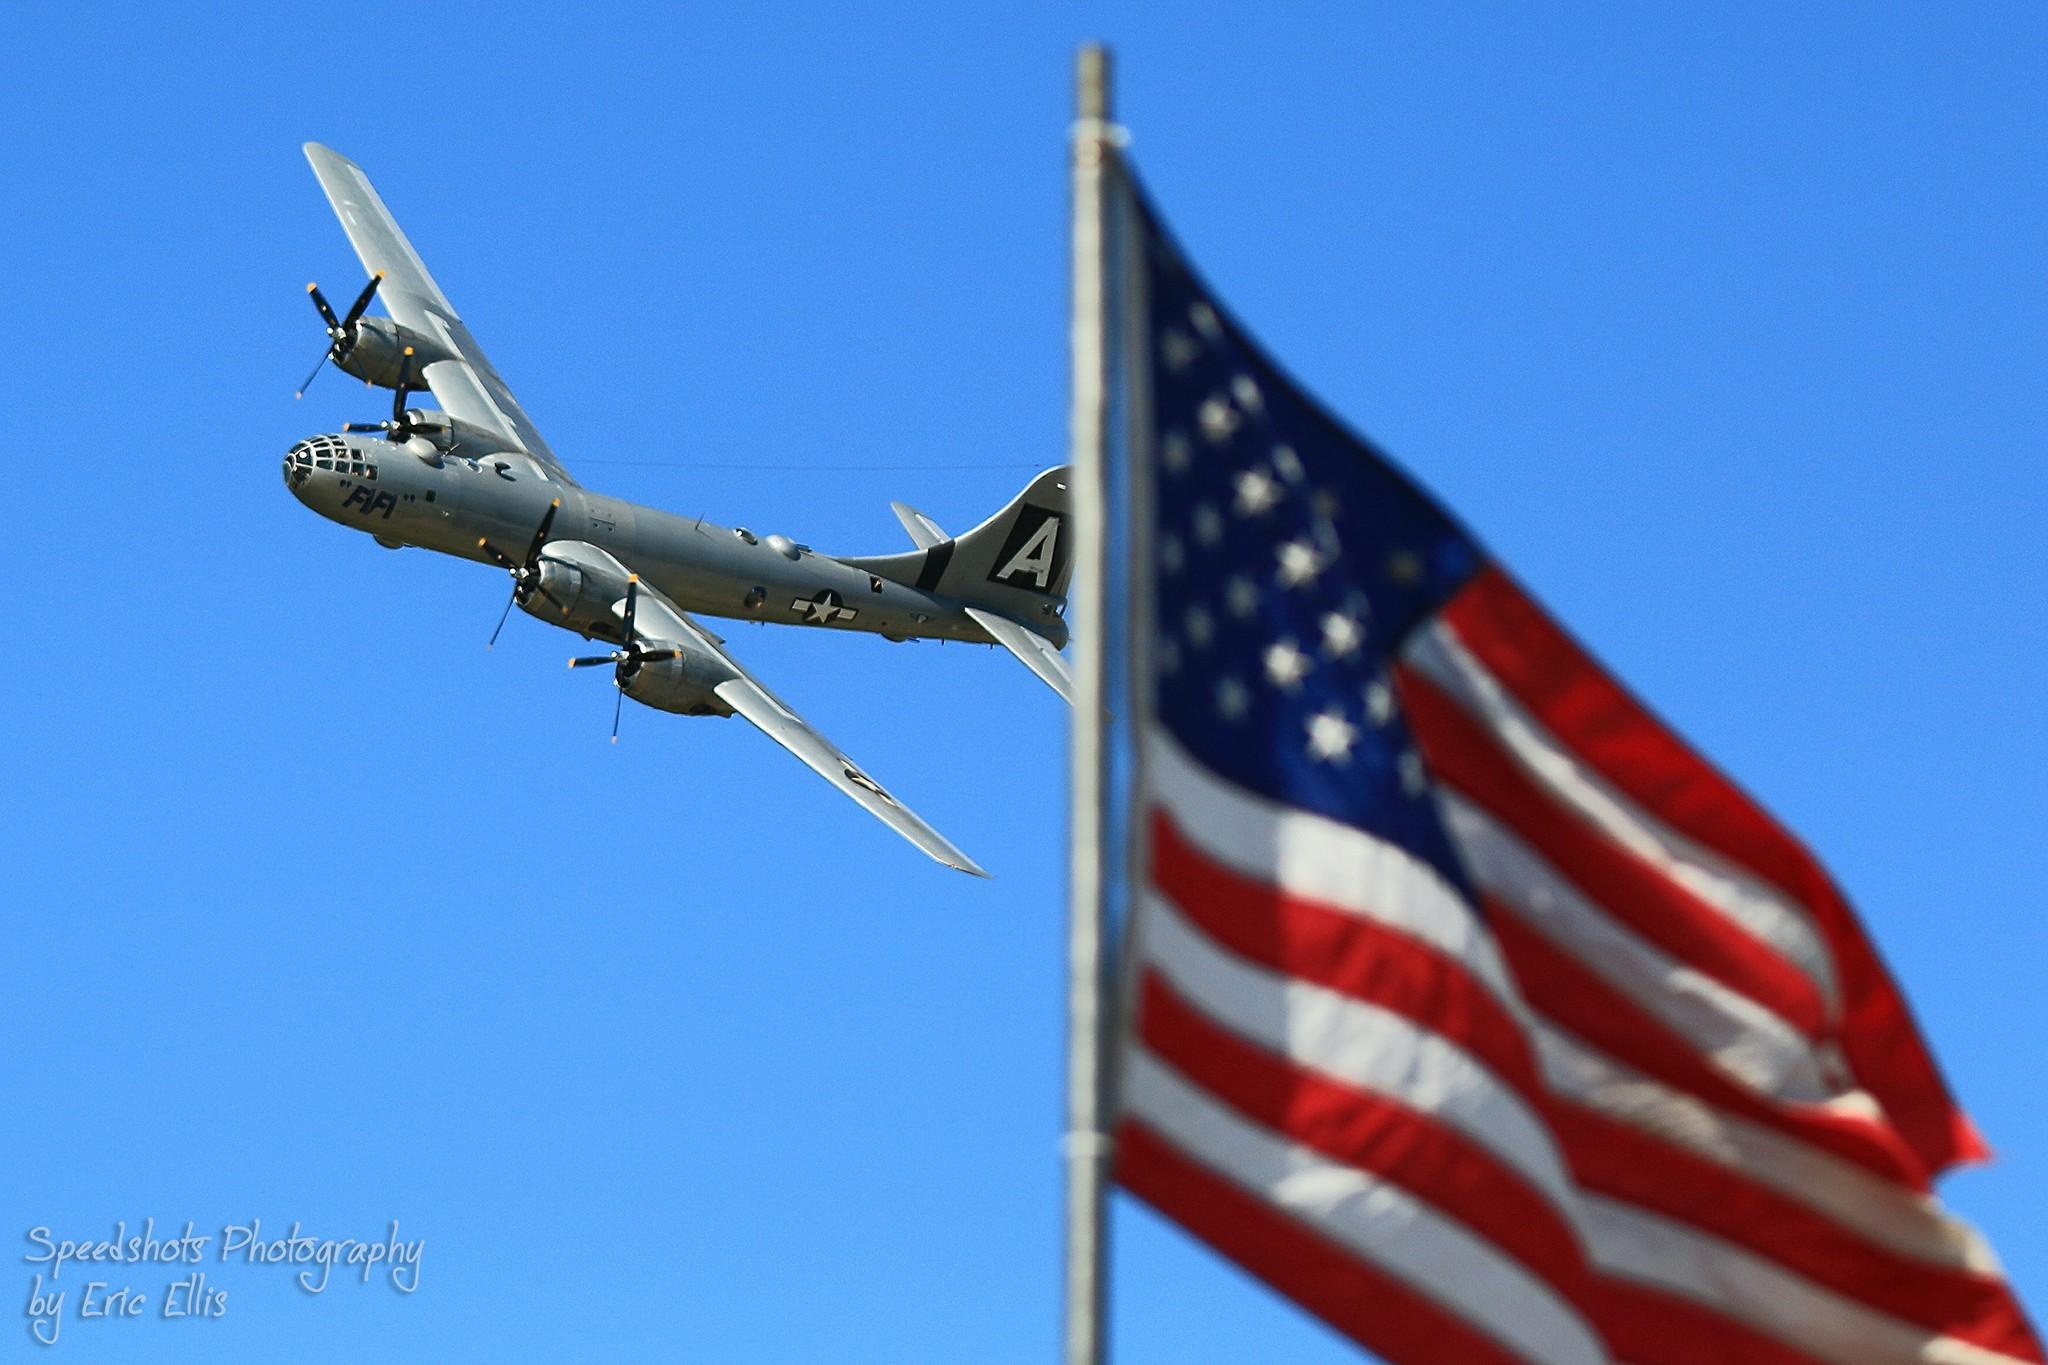 (Source: Eric Ellis via Commemorative Air Force B29 B24 Squadron on Facebook)